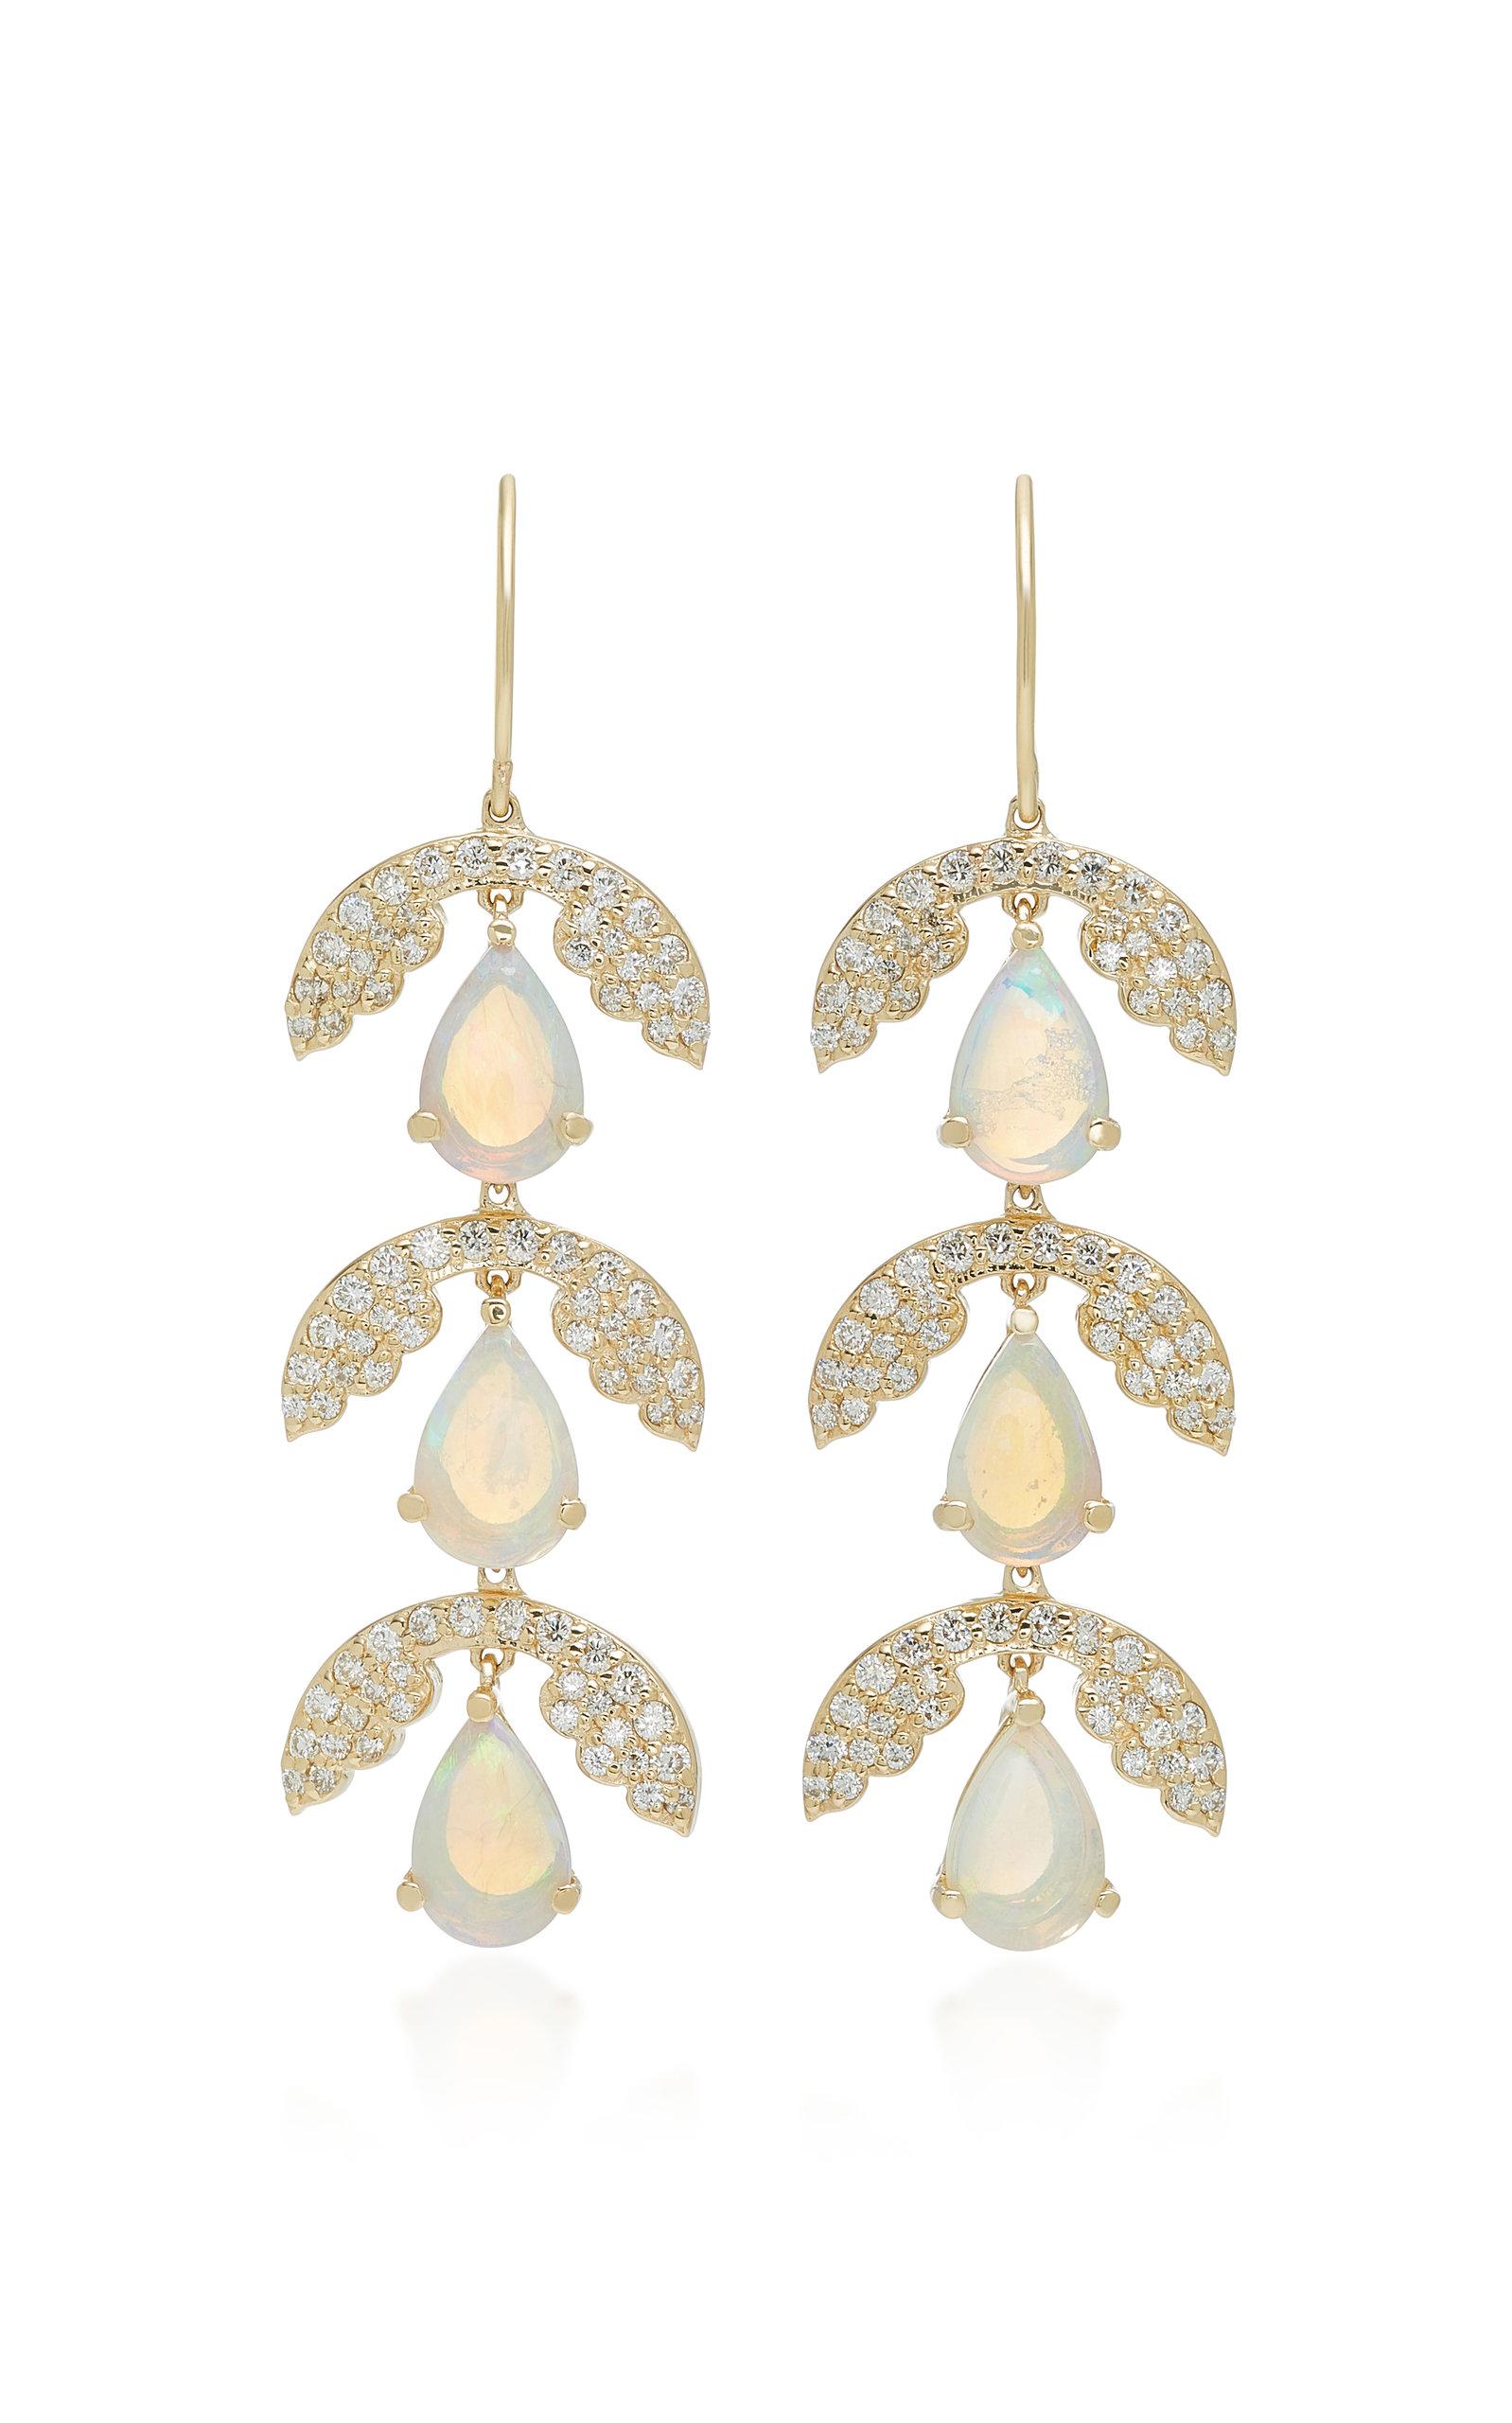 ILANA ARIEL Three Drop Jasmine 14K Gold Opal And Diamond Earrings in Green